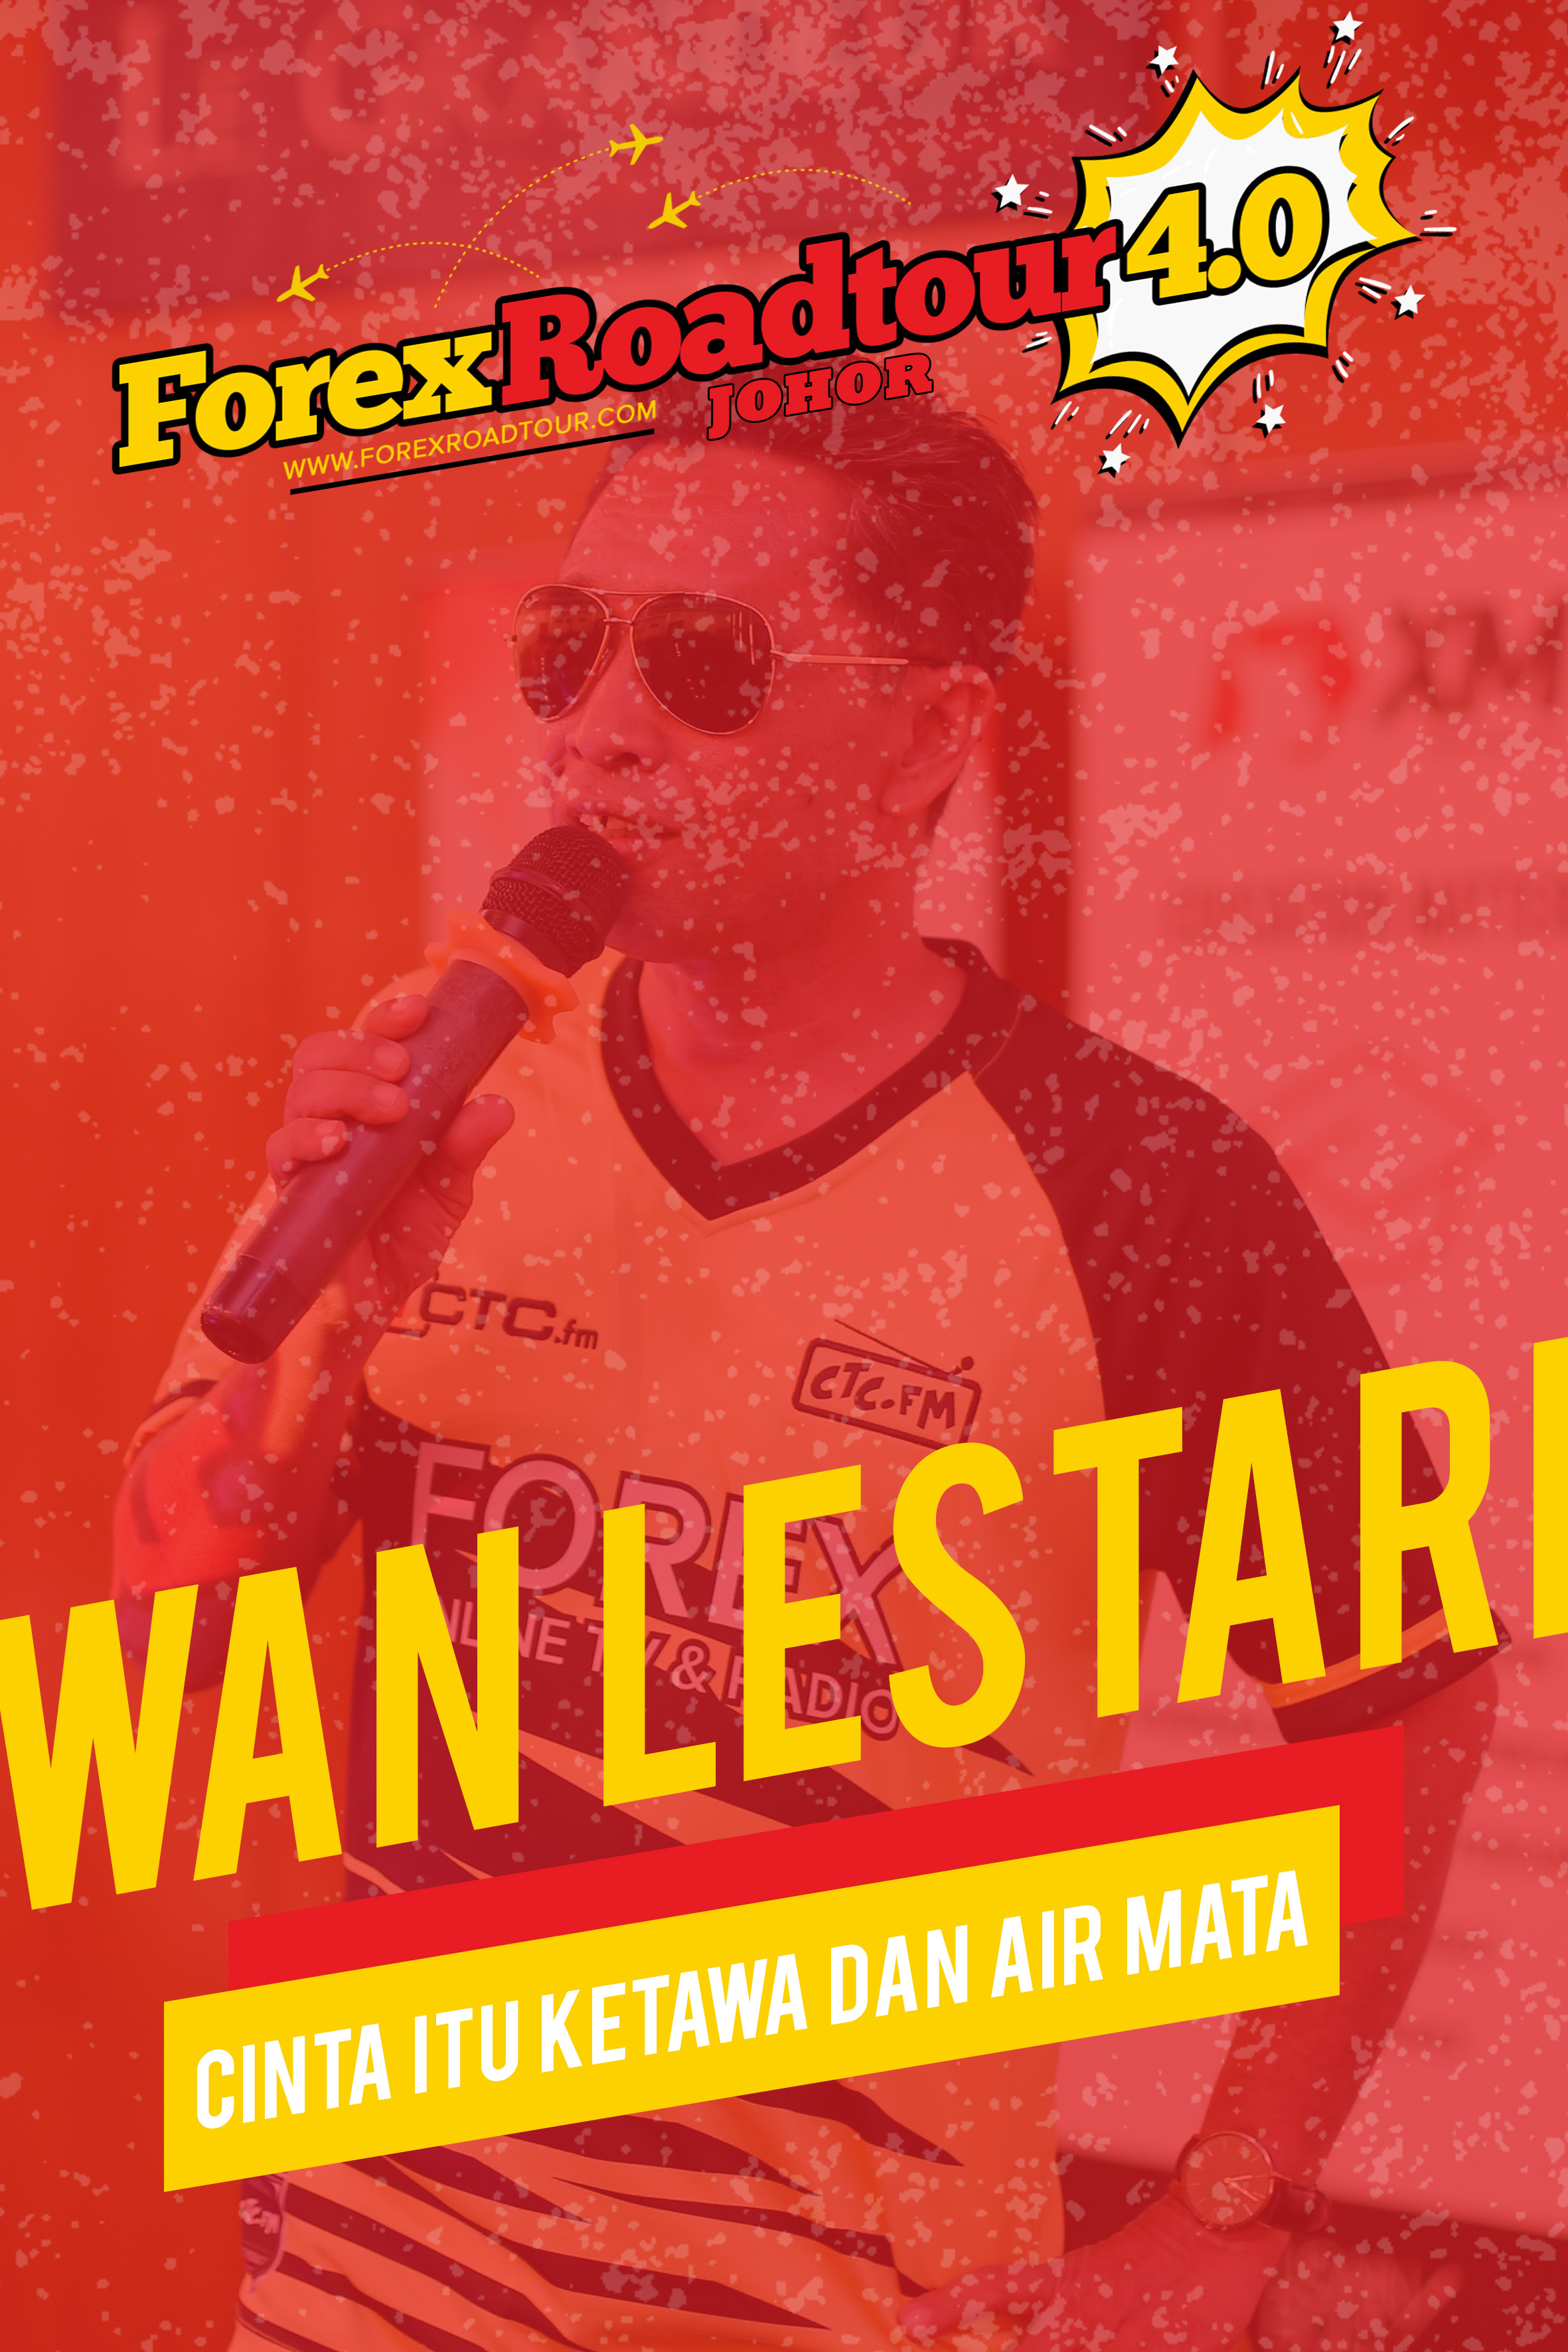 Wan Lestari - Cinta Itu Ketawa dan Air Mata [Forex Roadtour 4.0 Johor]